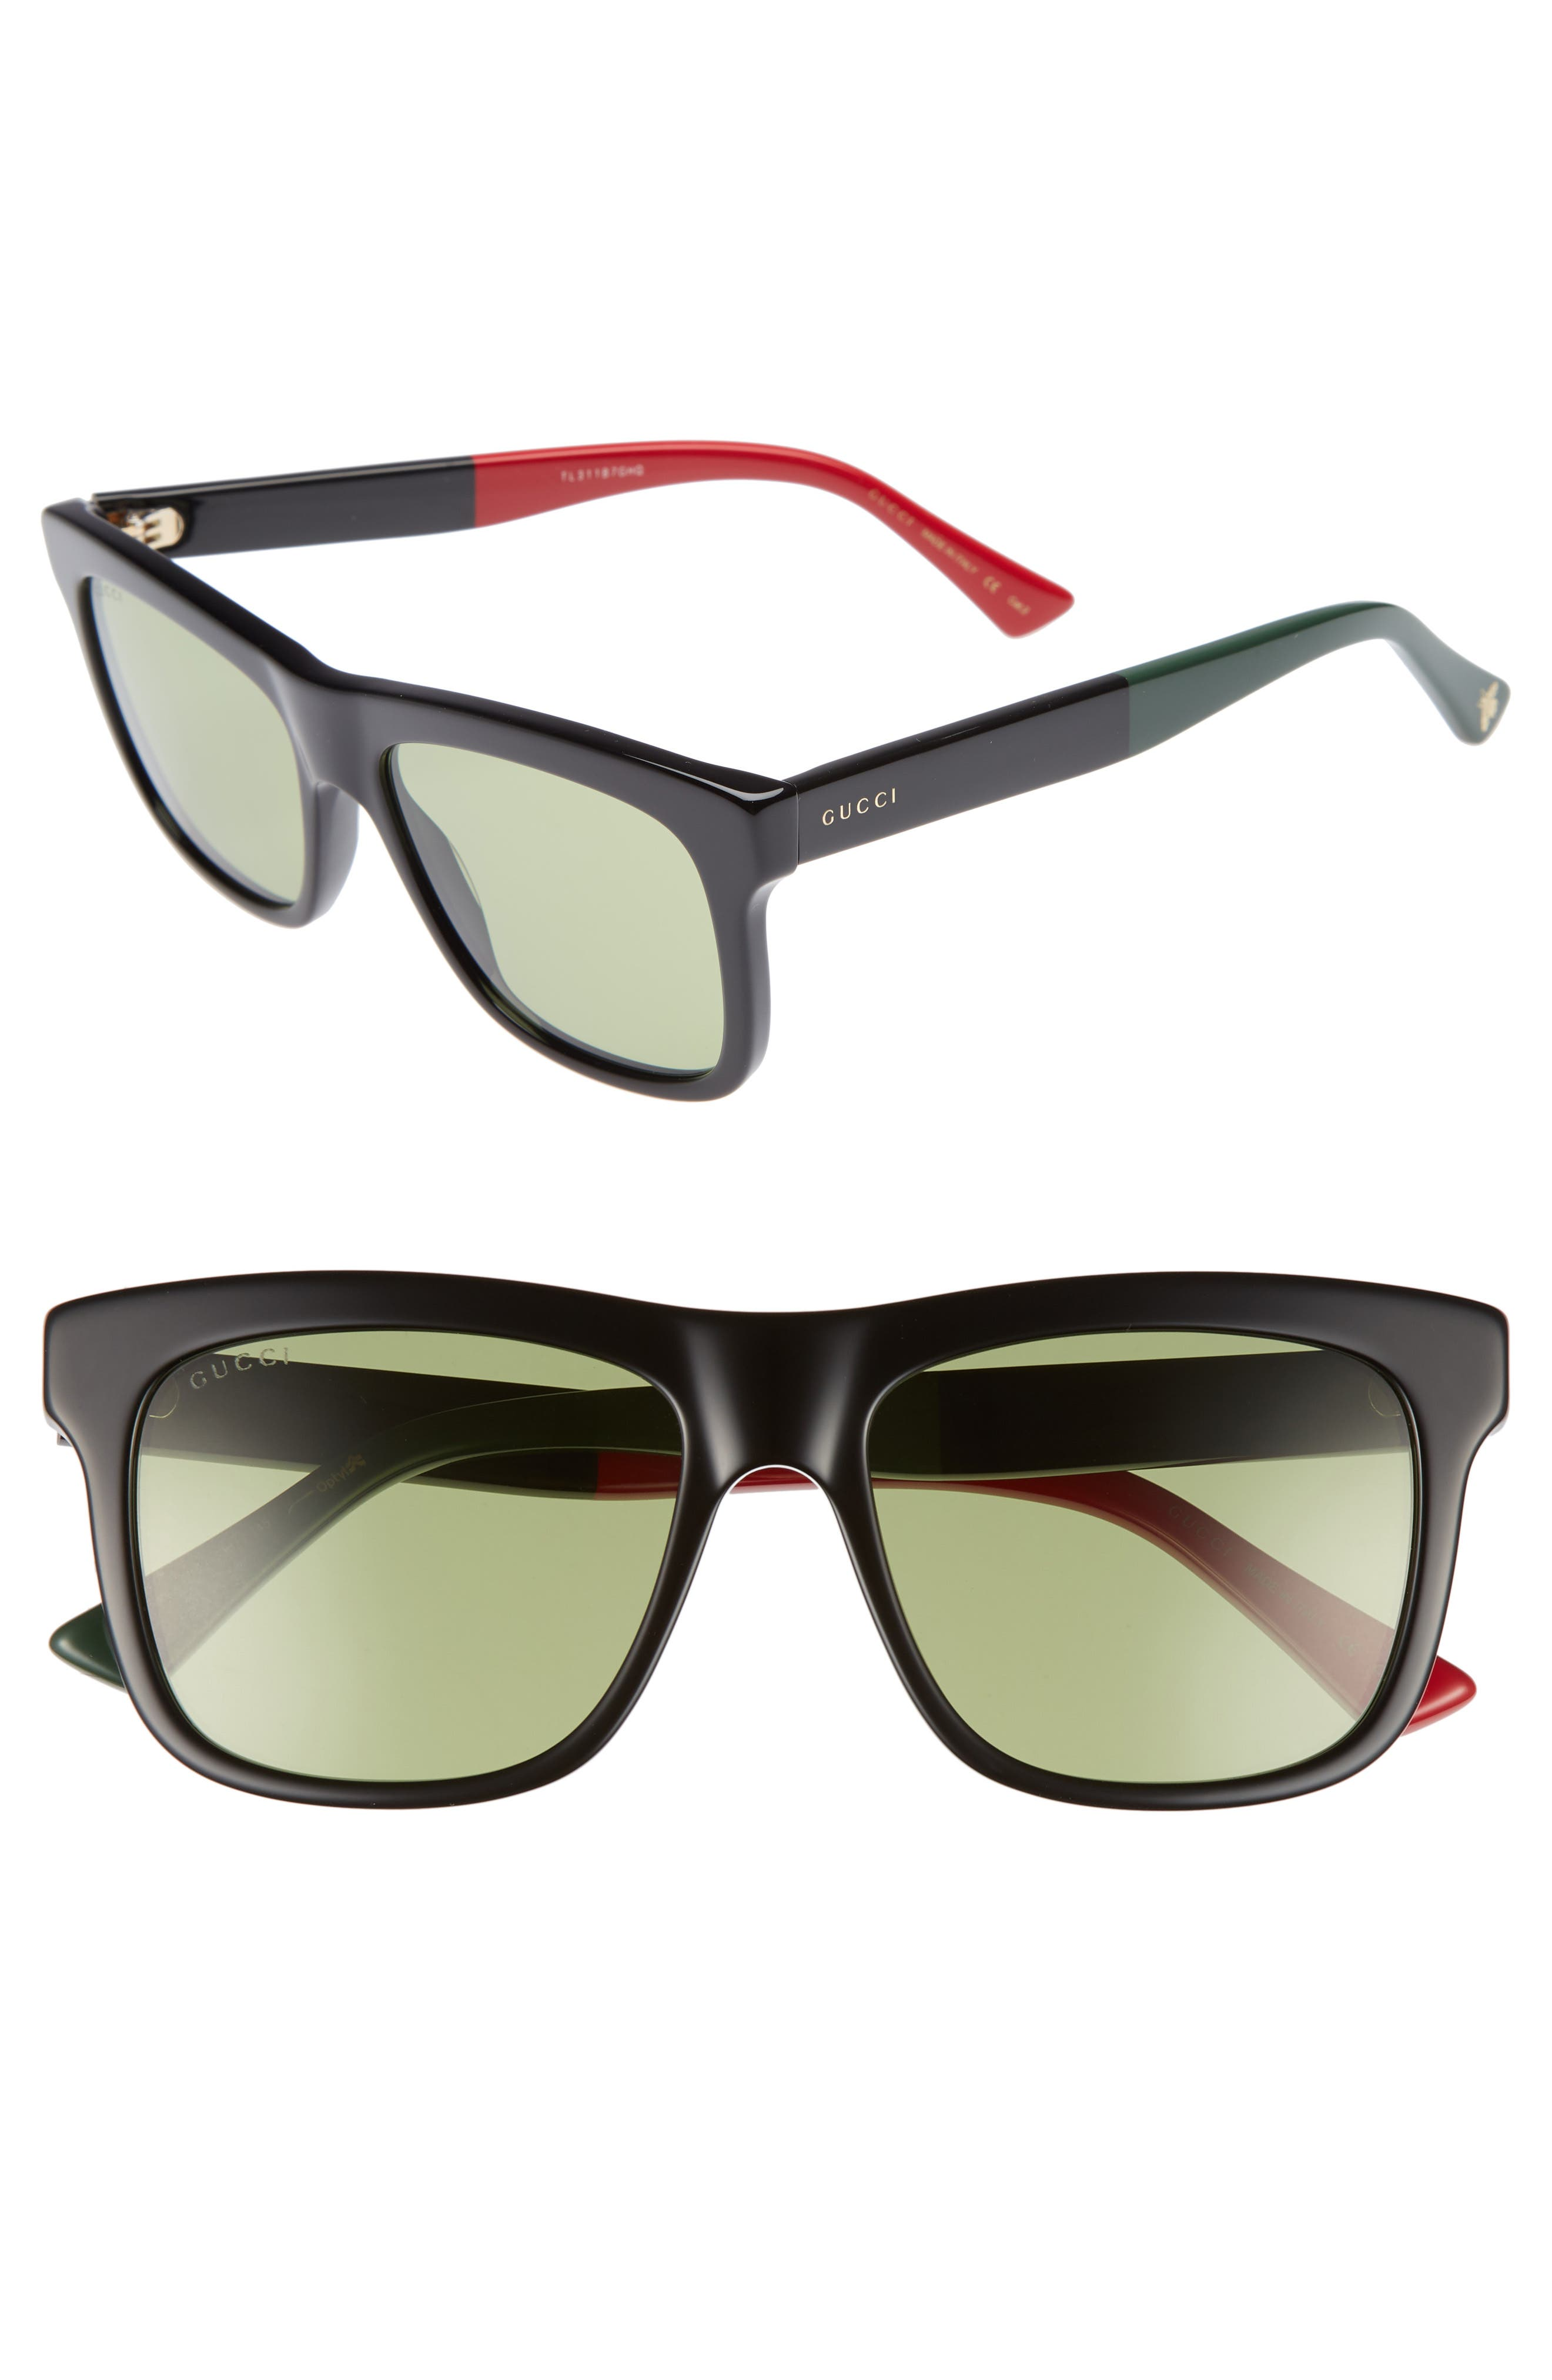 Gucci 54mm Sunglasses